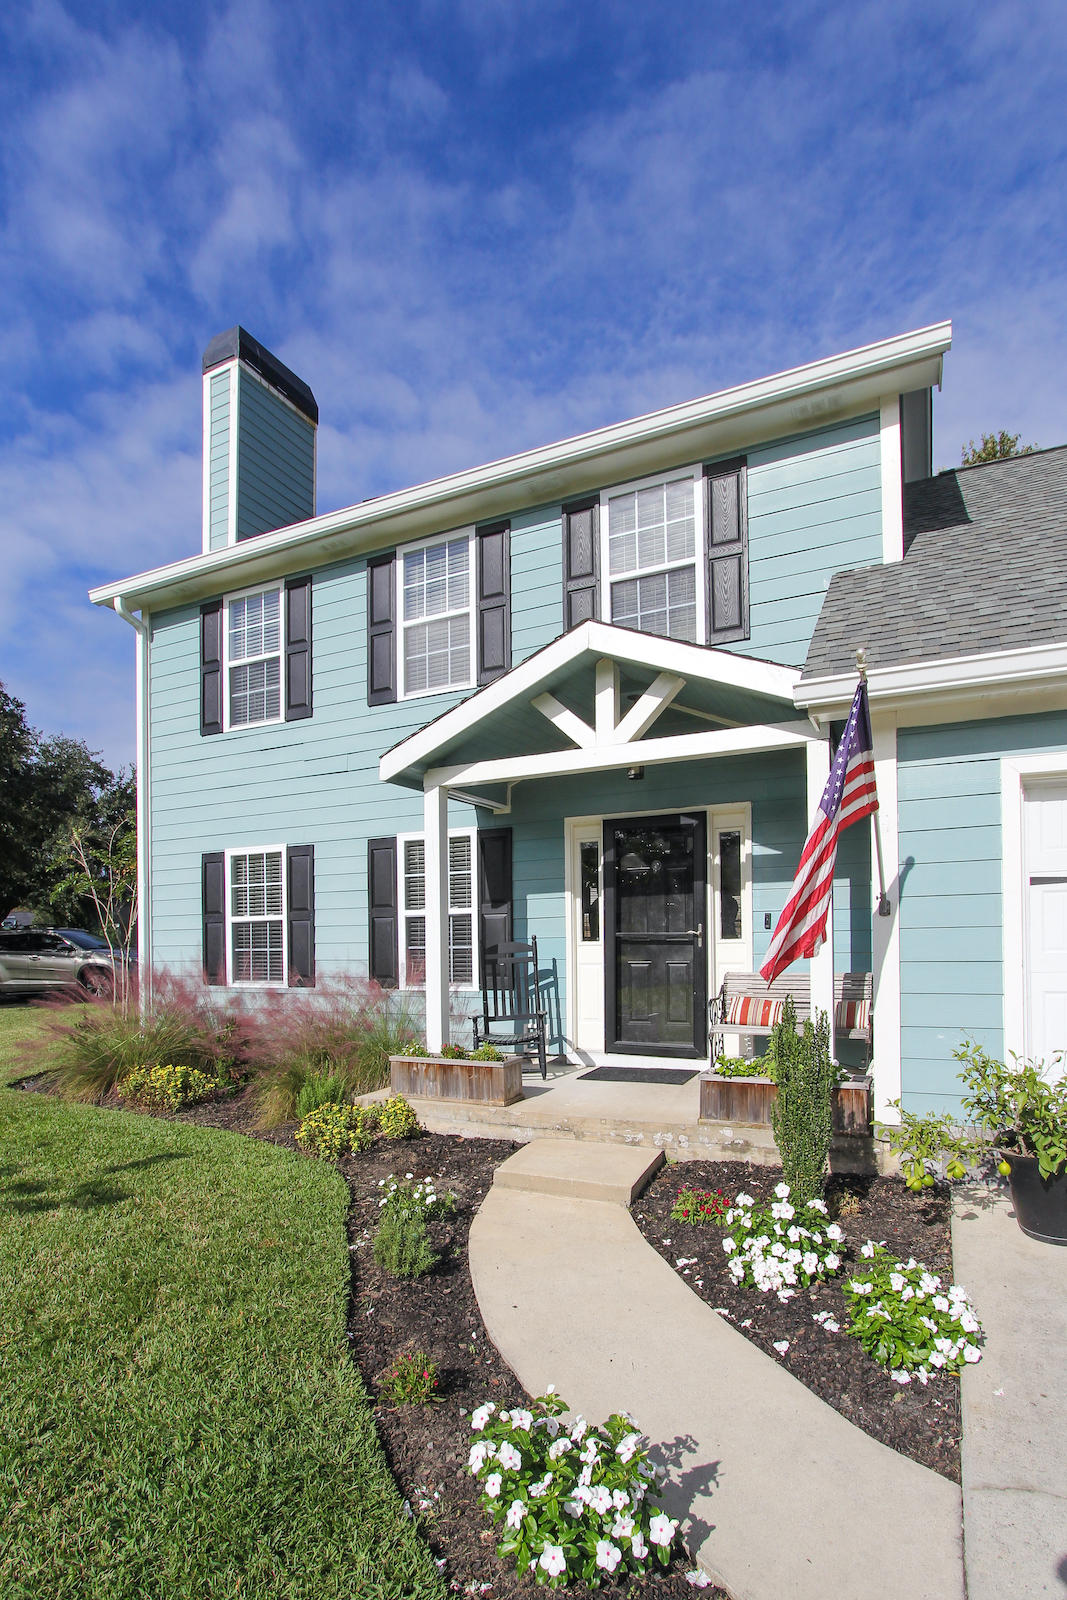 Landings Run Homes For Sale - 1548 Wickfield, Mount Pleasant, SC - 21